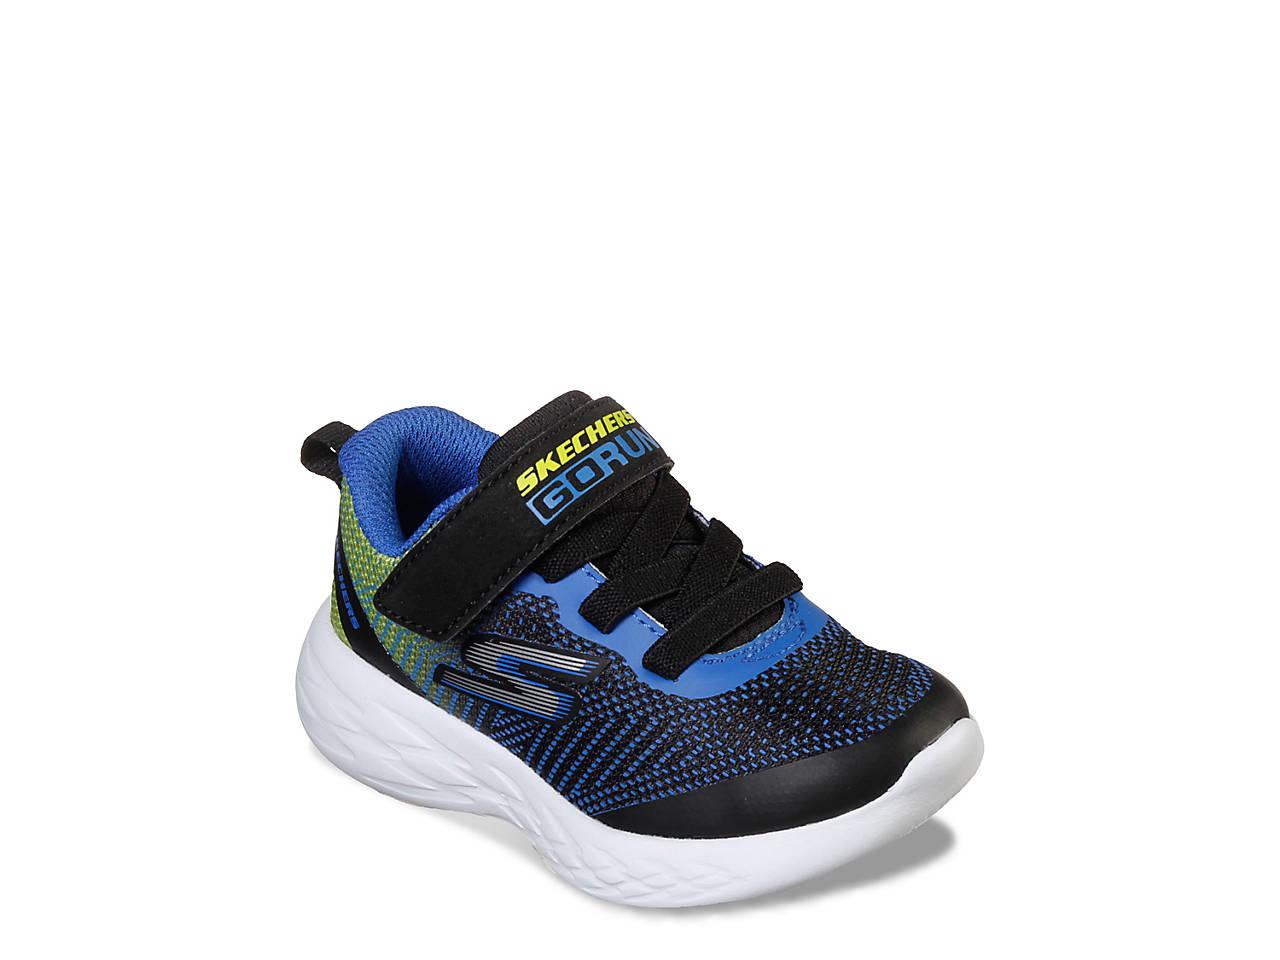 0d2566bcba1b8 Skechers GOrun 600 Farrox Toddler Sneaker Kids Shoes | DSW